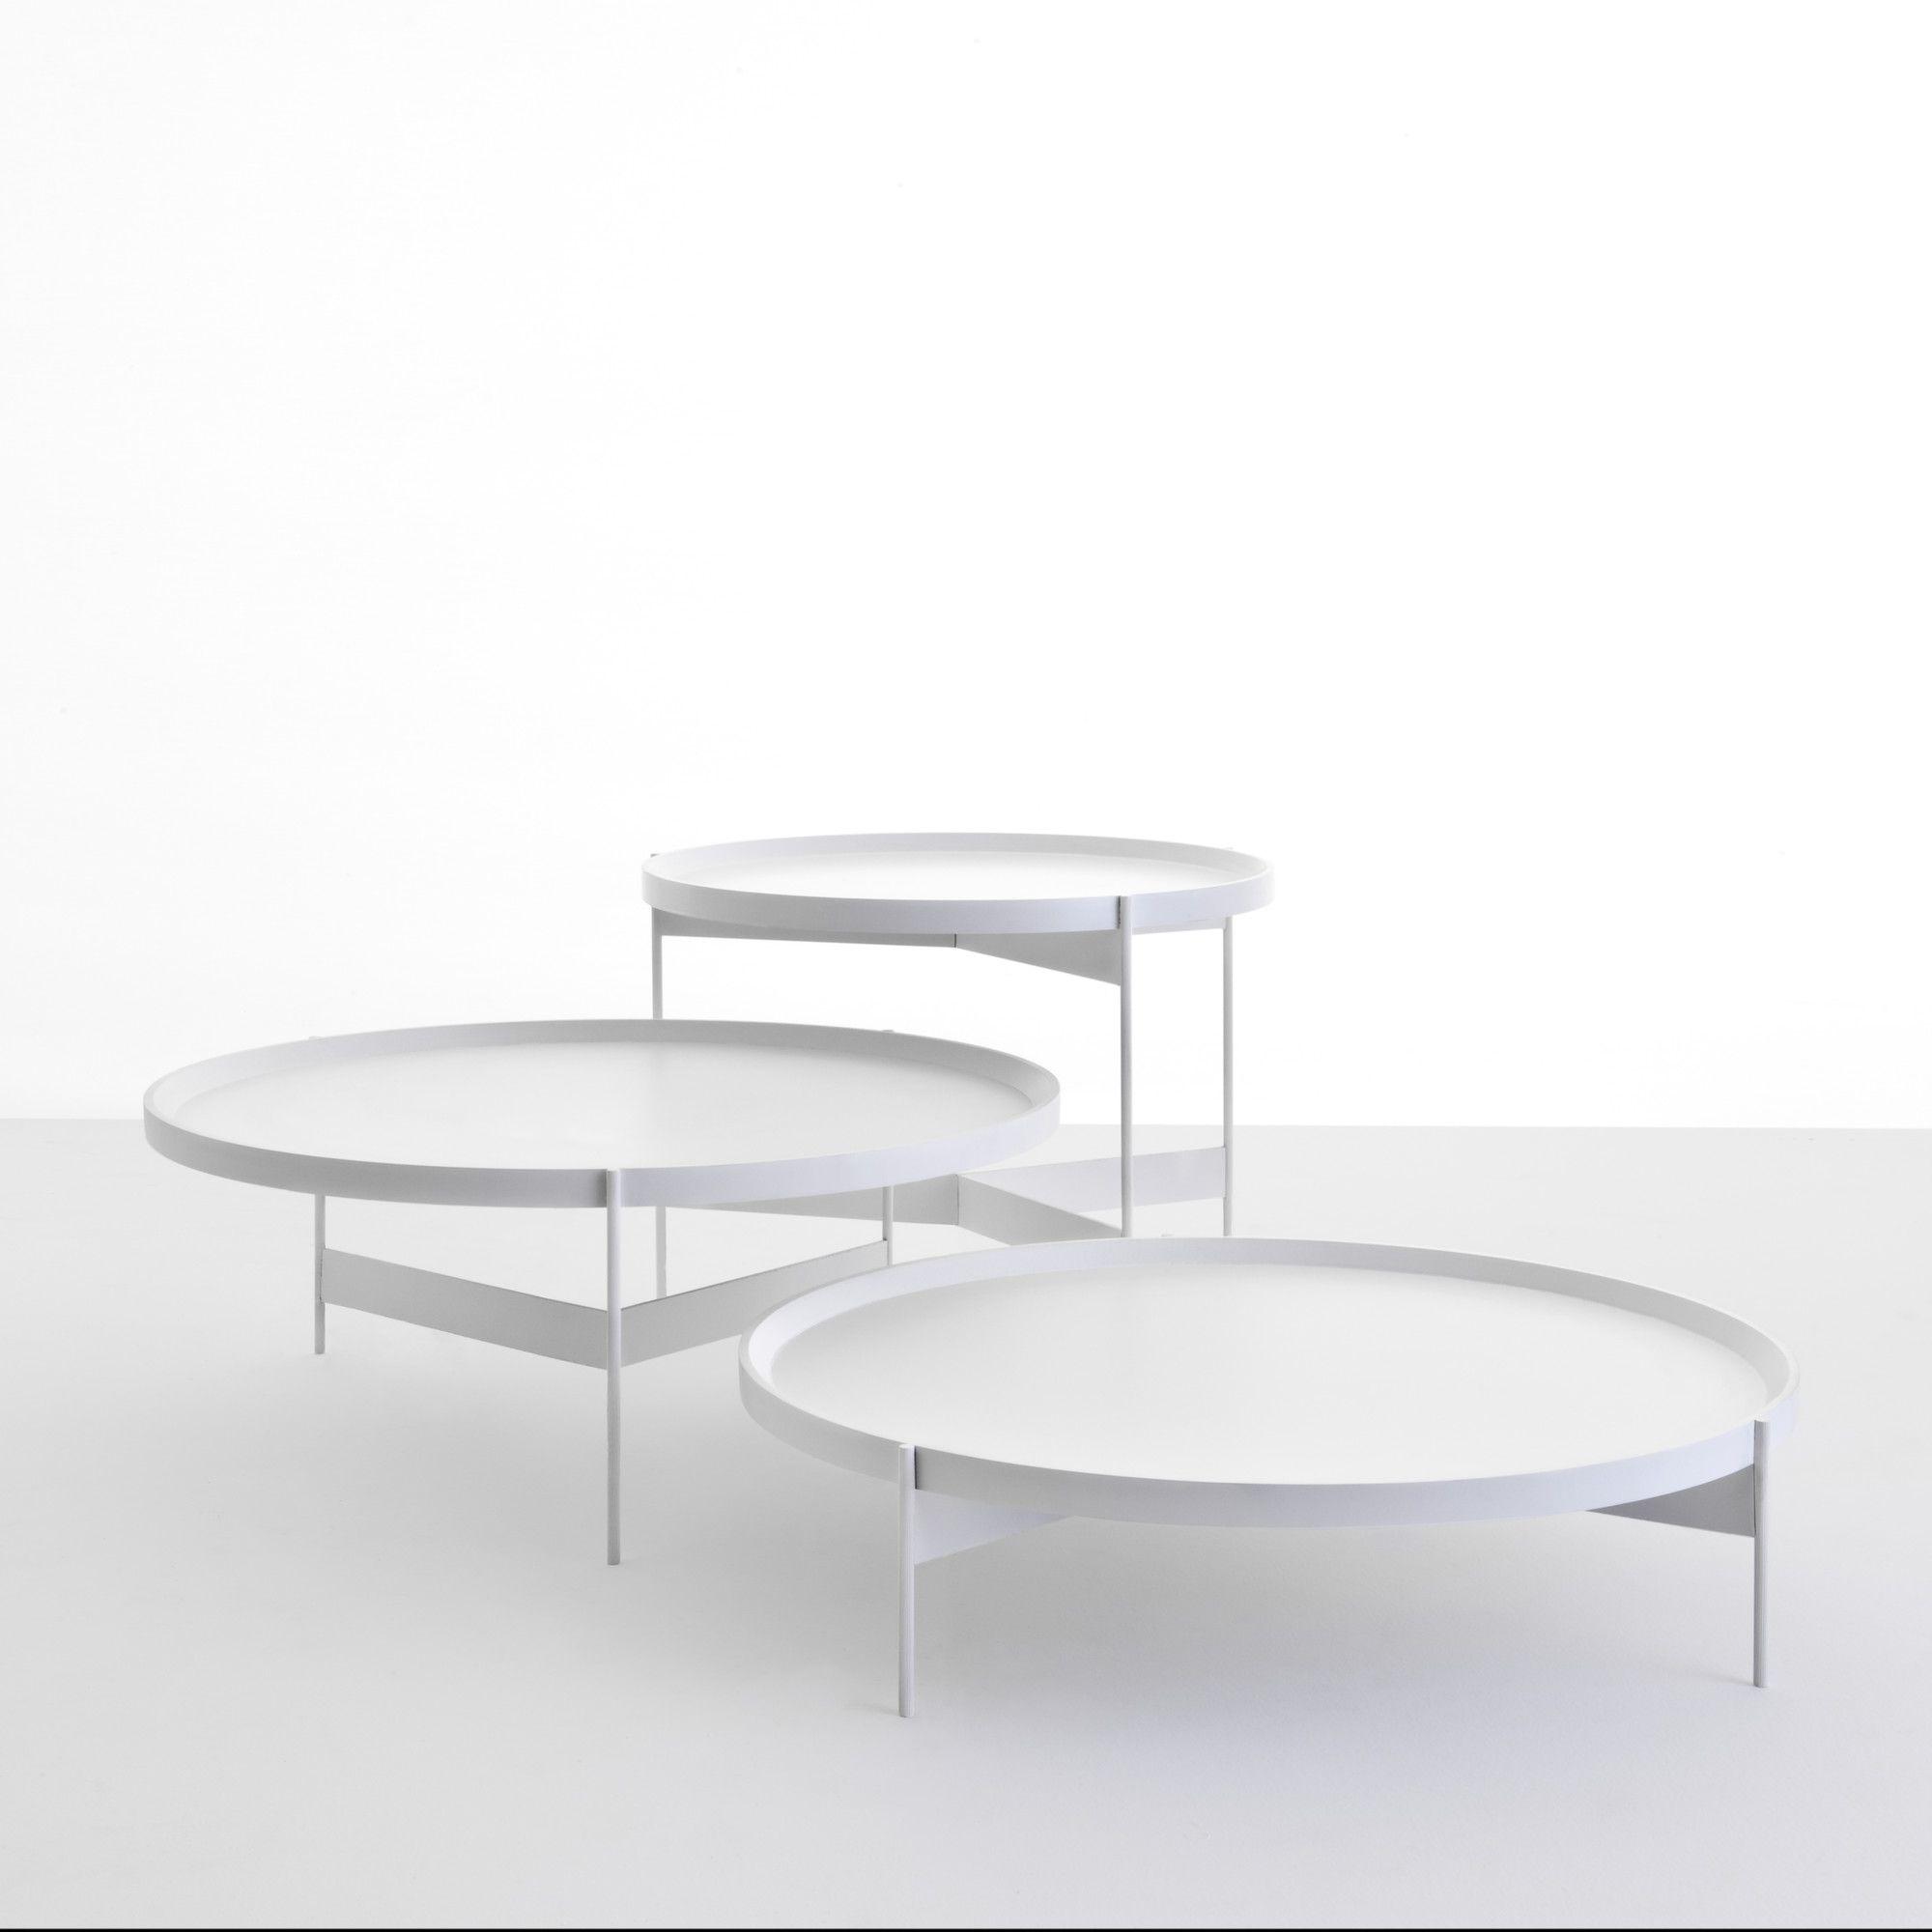 Pianca Usa Abaco Coffee Table Coffee Table Round Coffee Table Ikea Furniture [ 2000 x 2000 Pixel ]